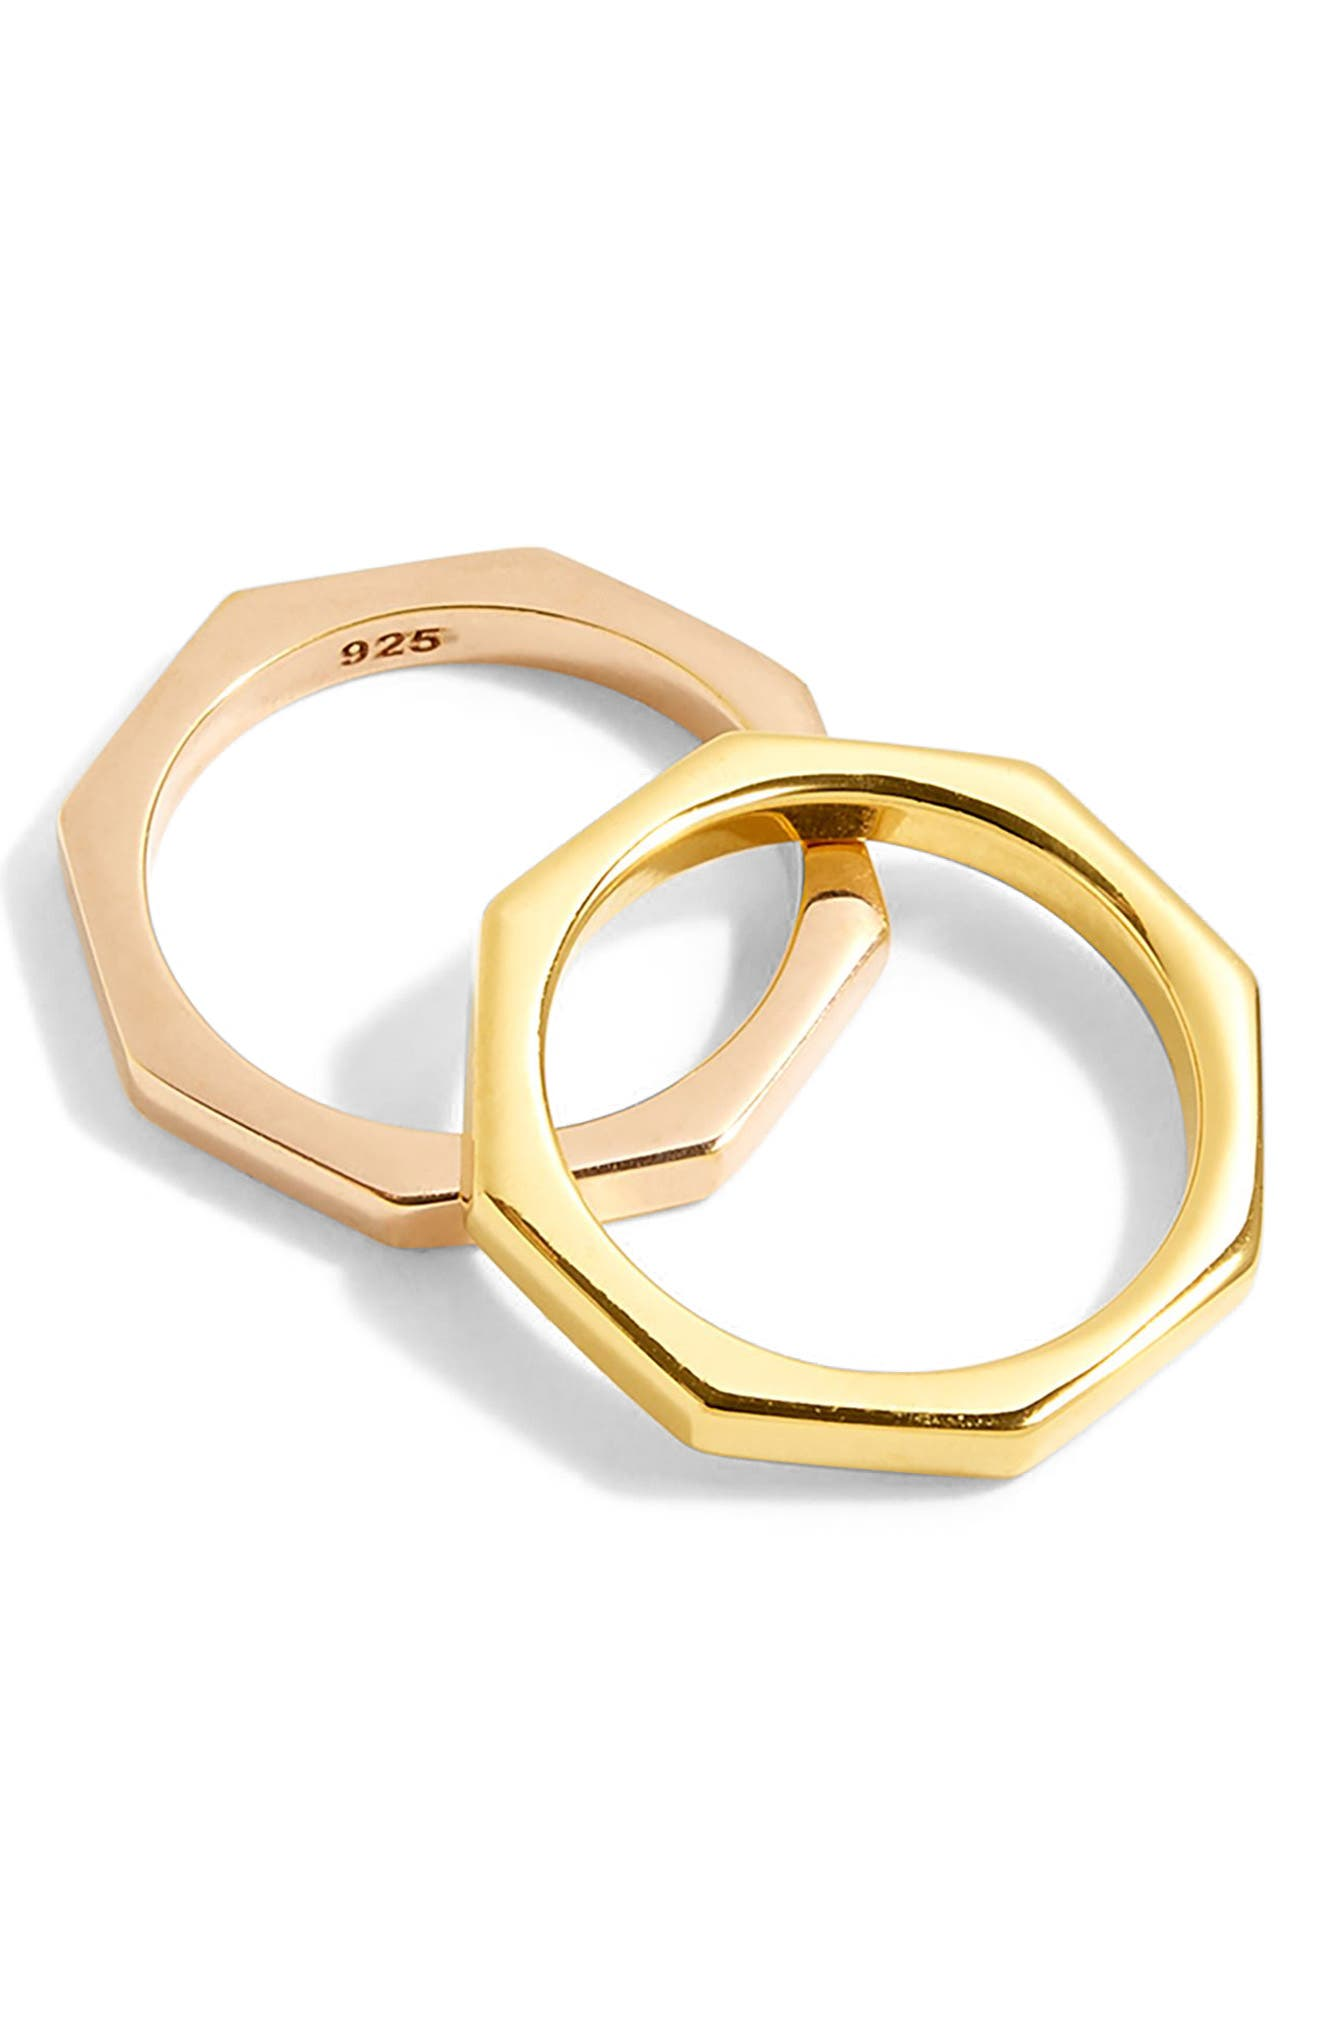 J.Crew Hexagon Stacked Rings